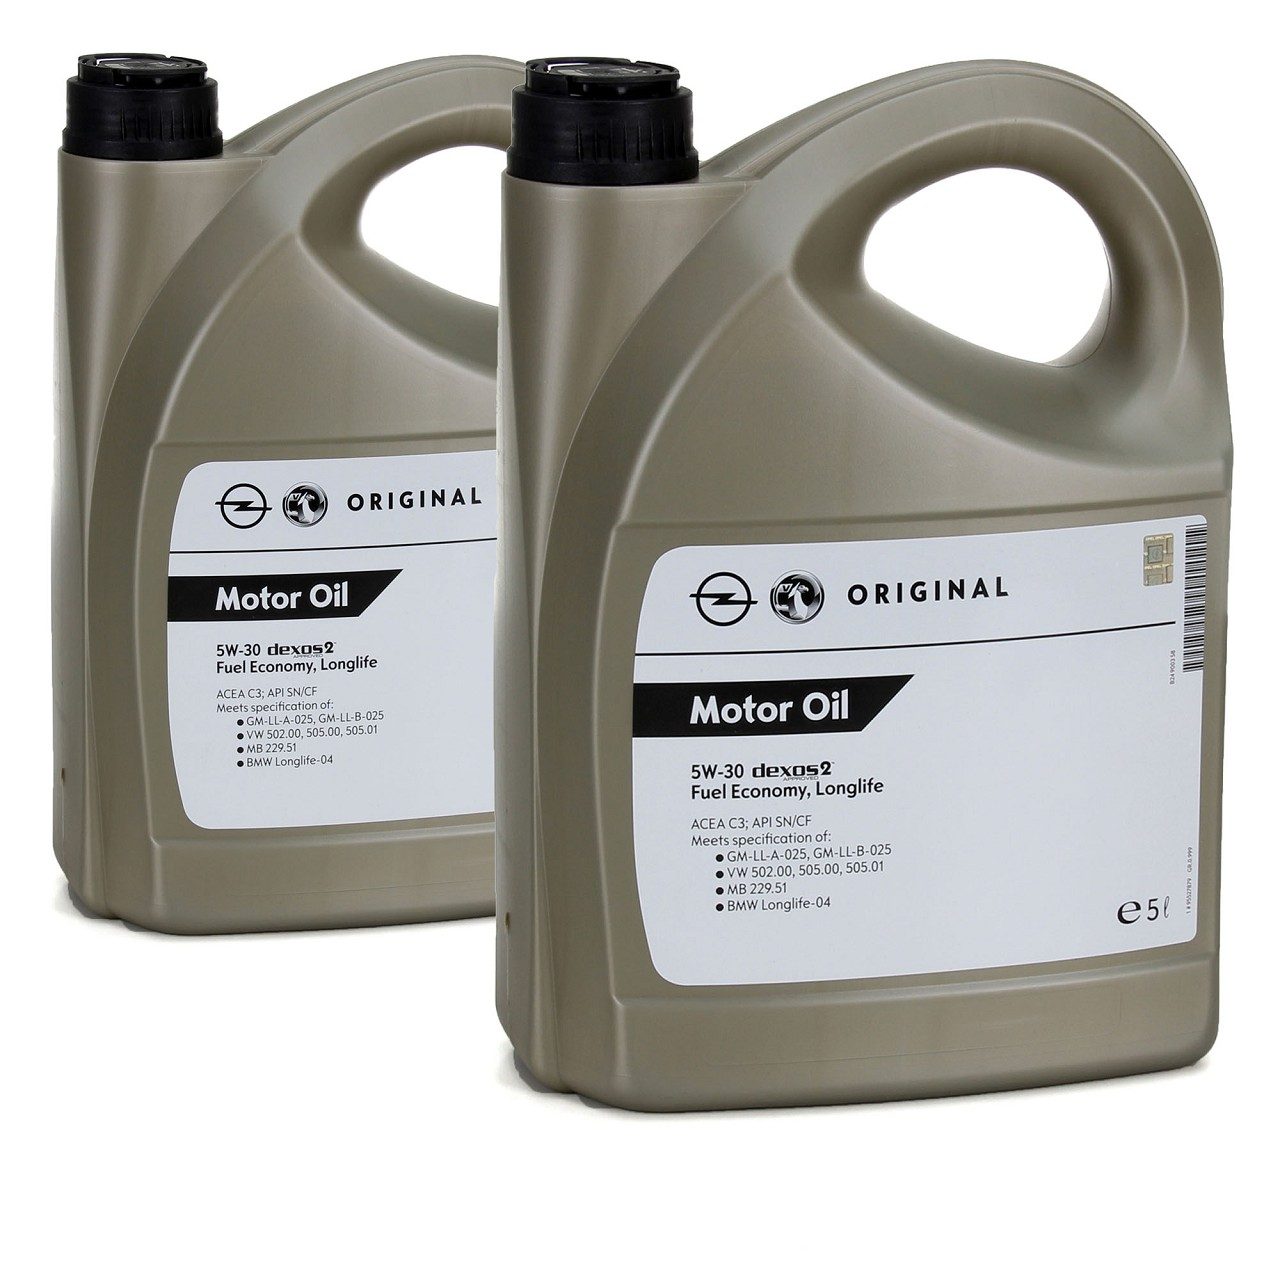 2x 5L ORIGINAL GM Opel Motoröl ÖL 5W30 dexos2 Fuel Economy Longlife 95527879